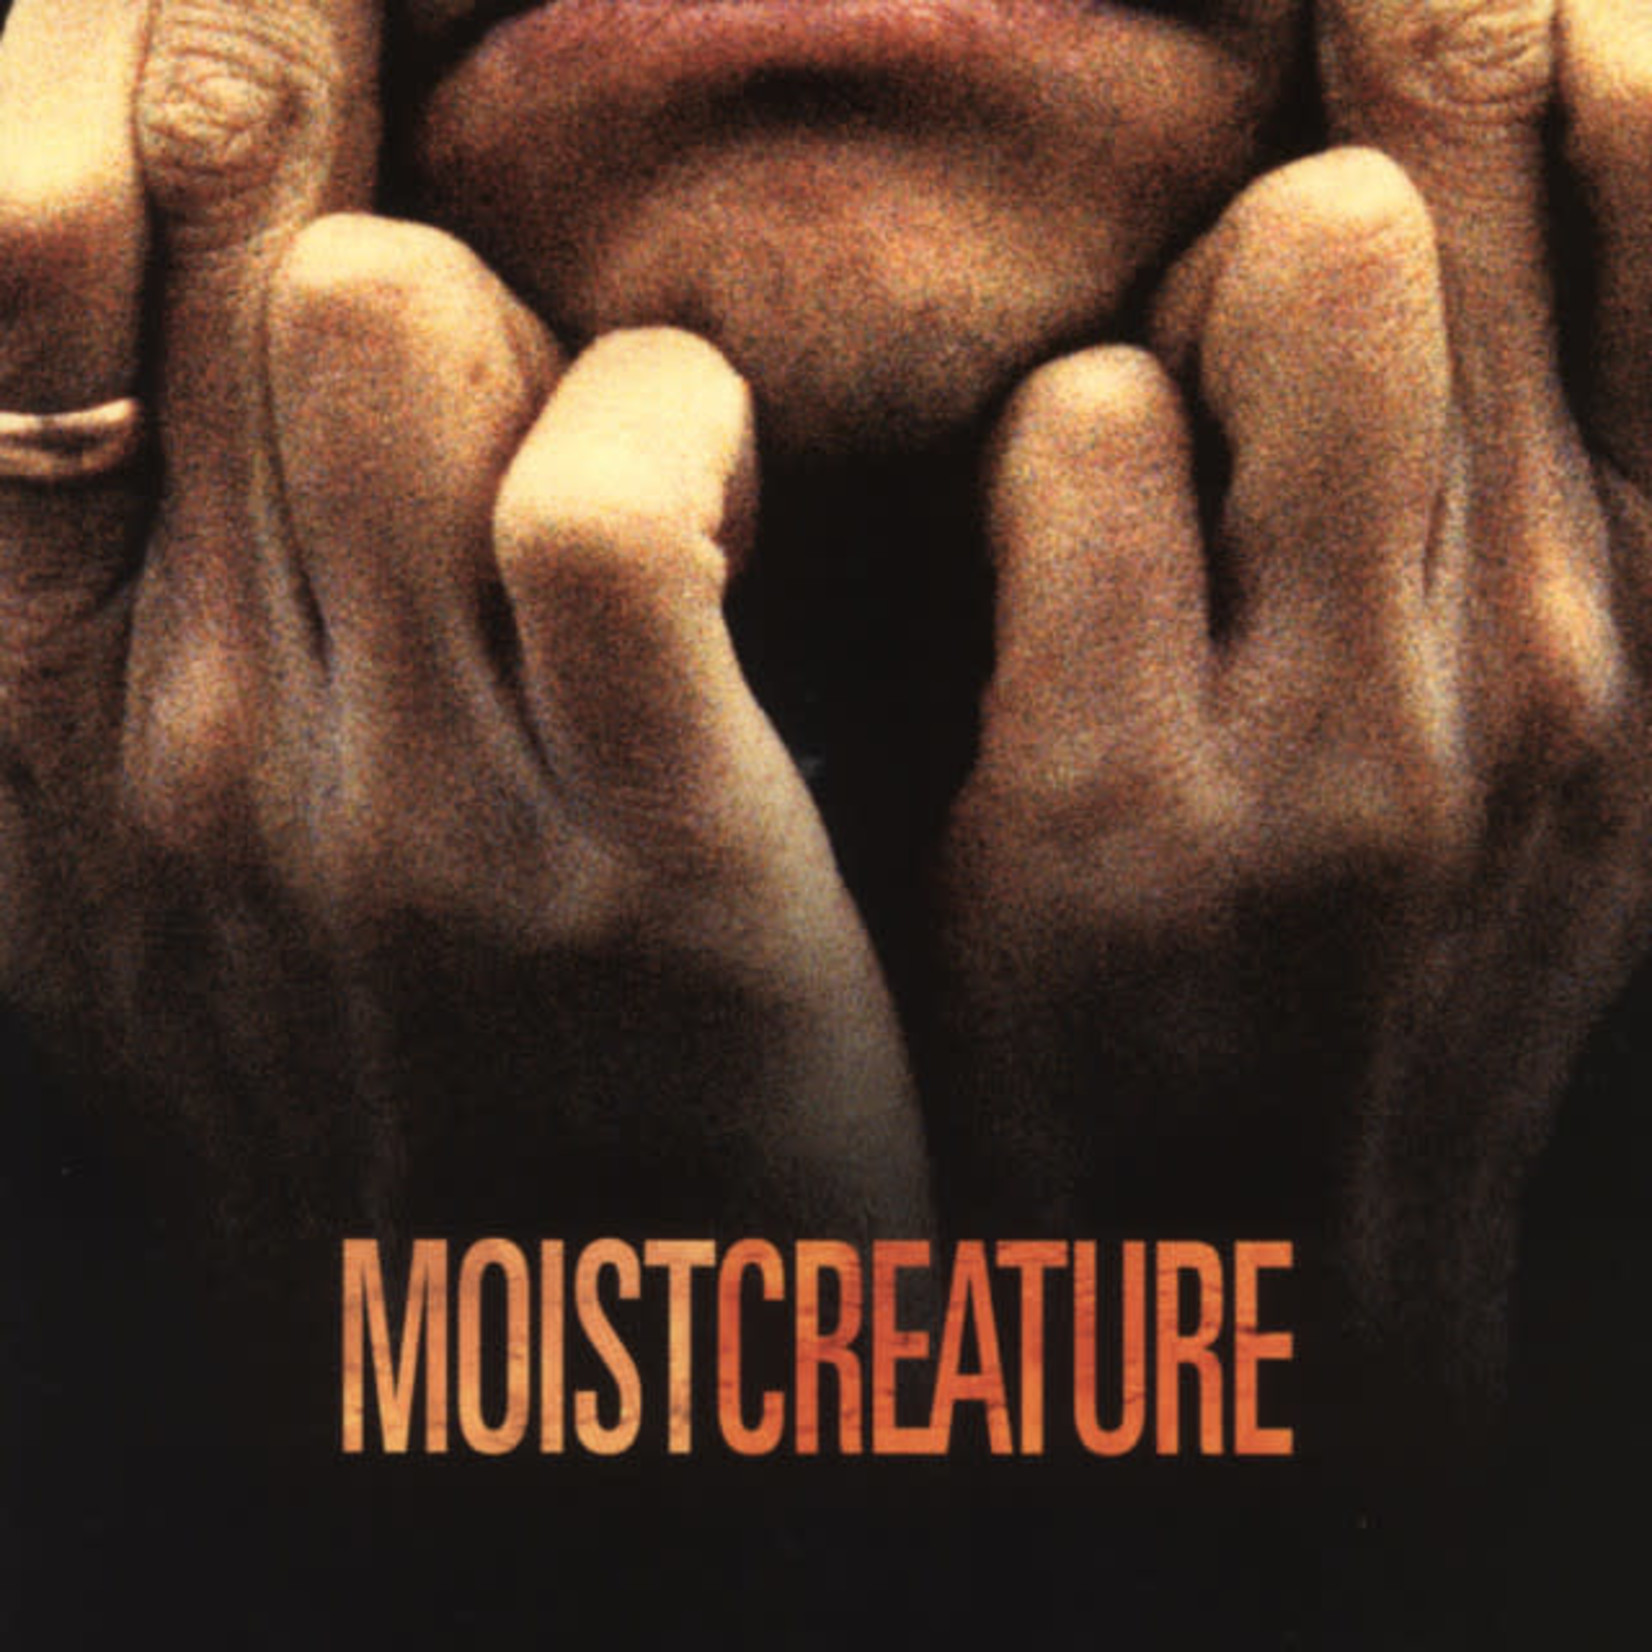 Vinyl Moist - Creature  Final Sale